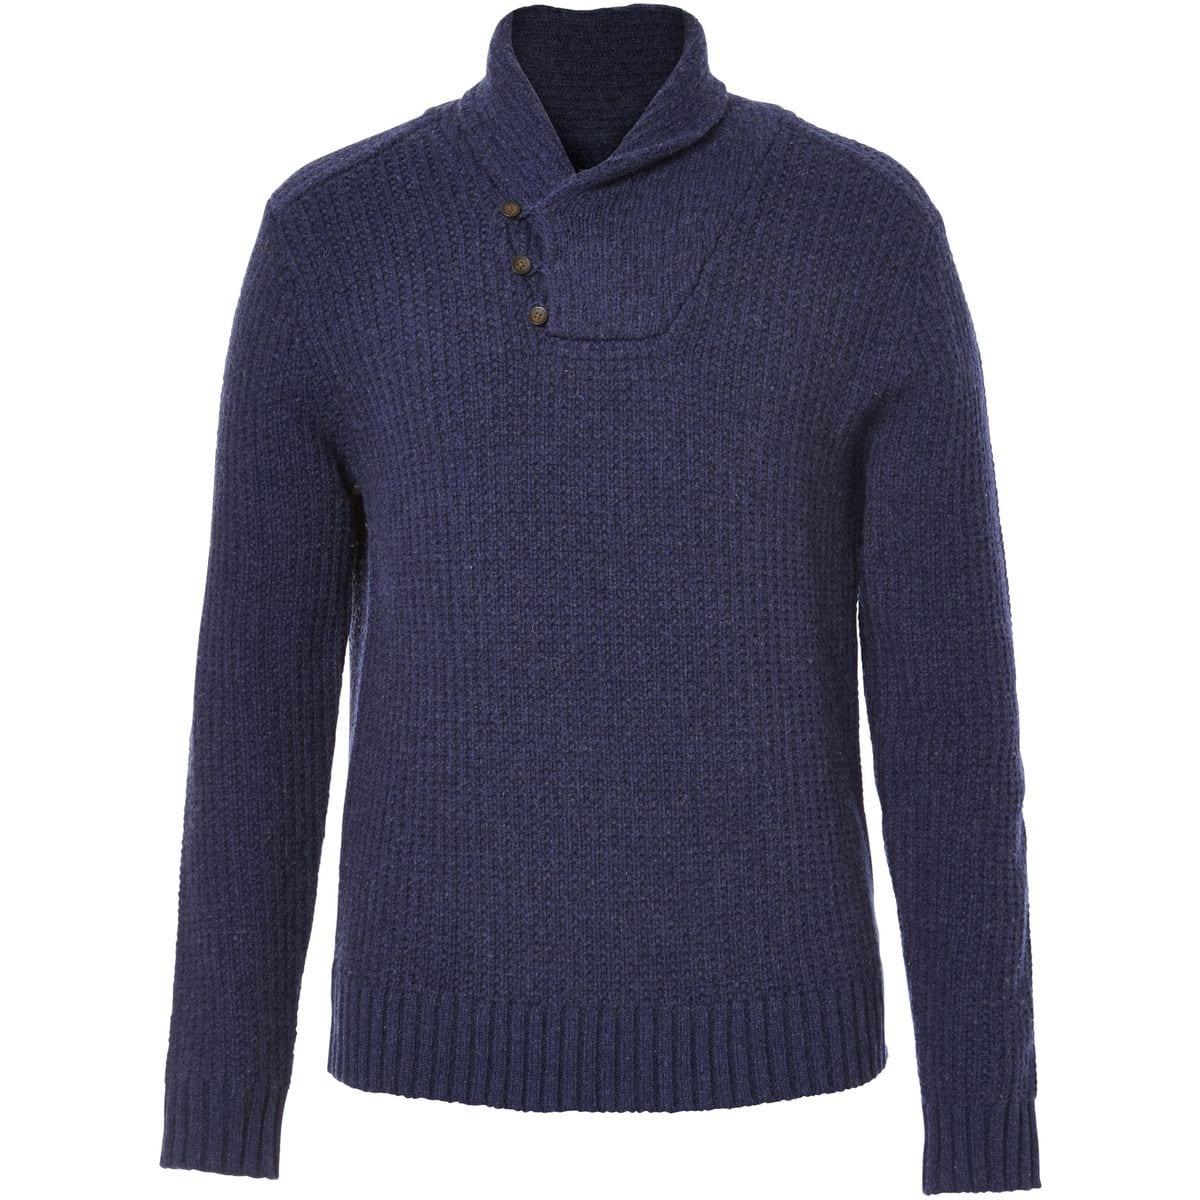 Royal Robbins Fishermans Shawl Sweater - Men